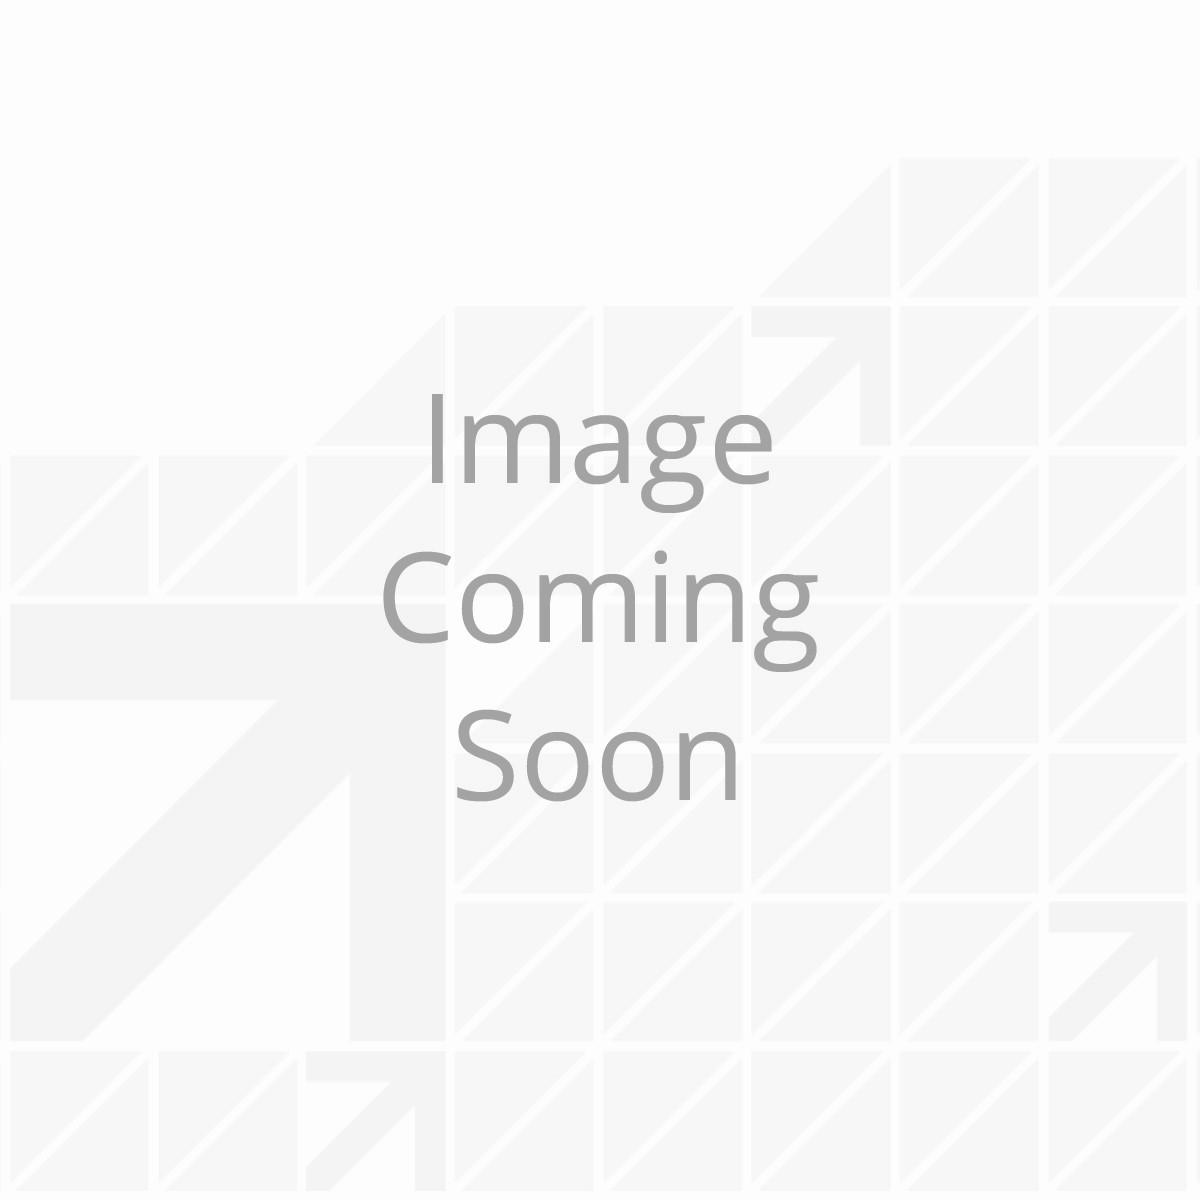 359218_-_pg_leveling_control_kit_-_001